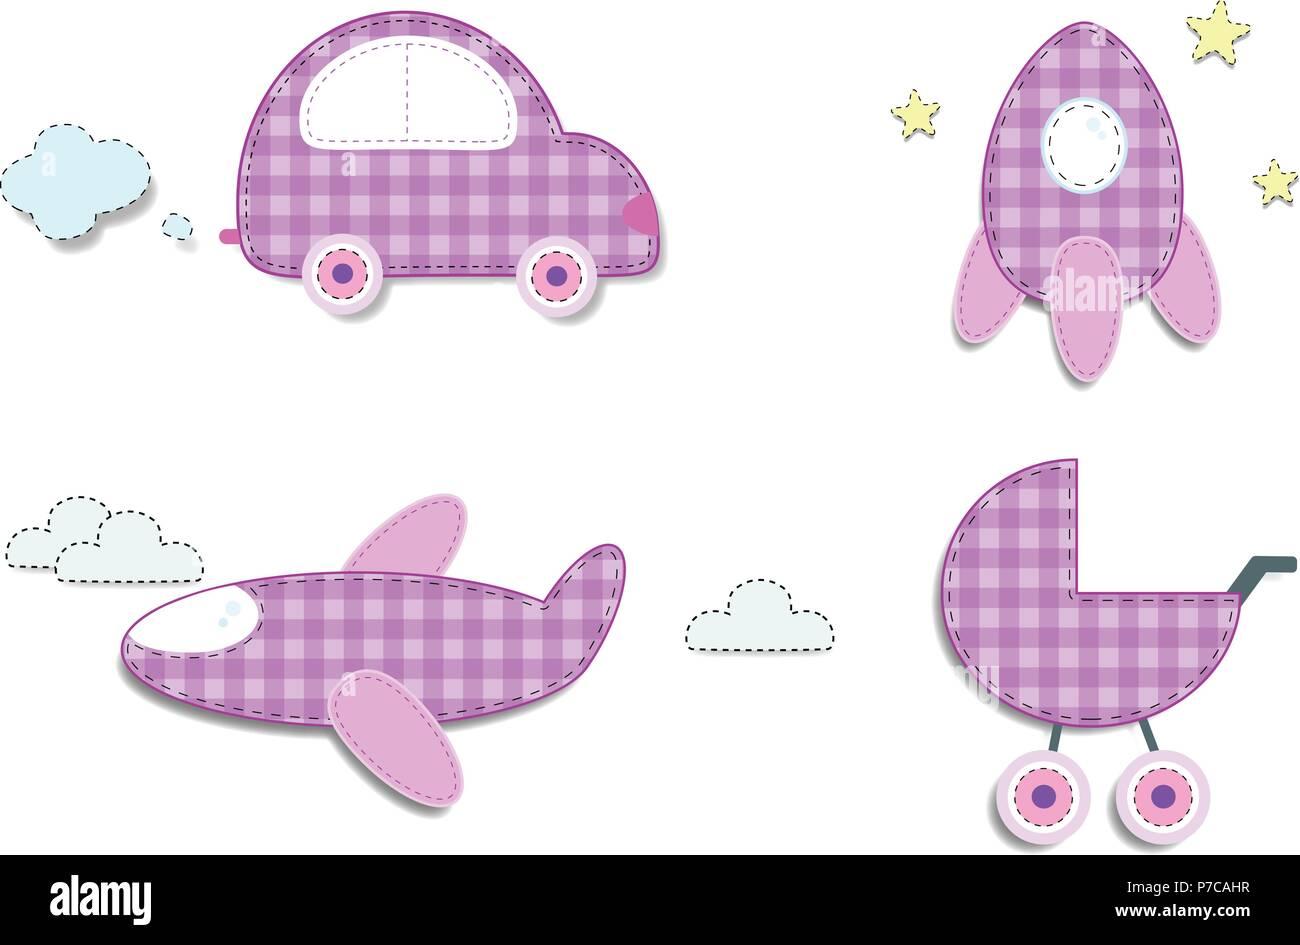 Vector Set Of Cute Baby Girl Clip Art Elements For Scrapbook Or Baby